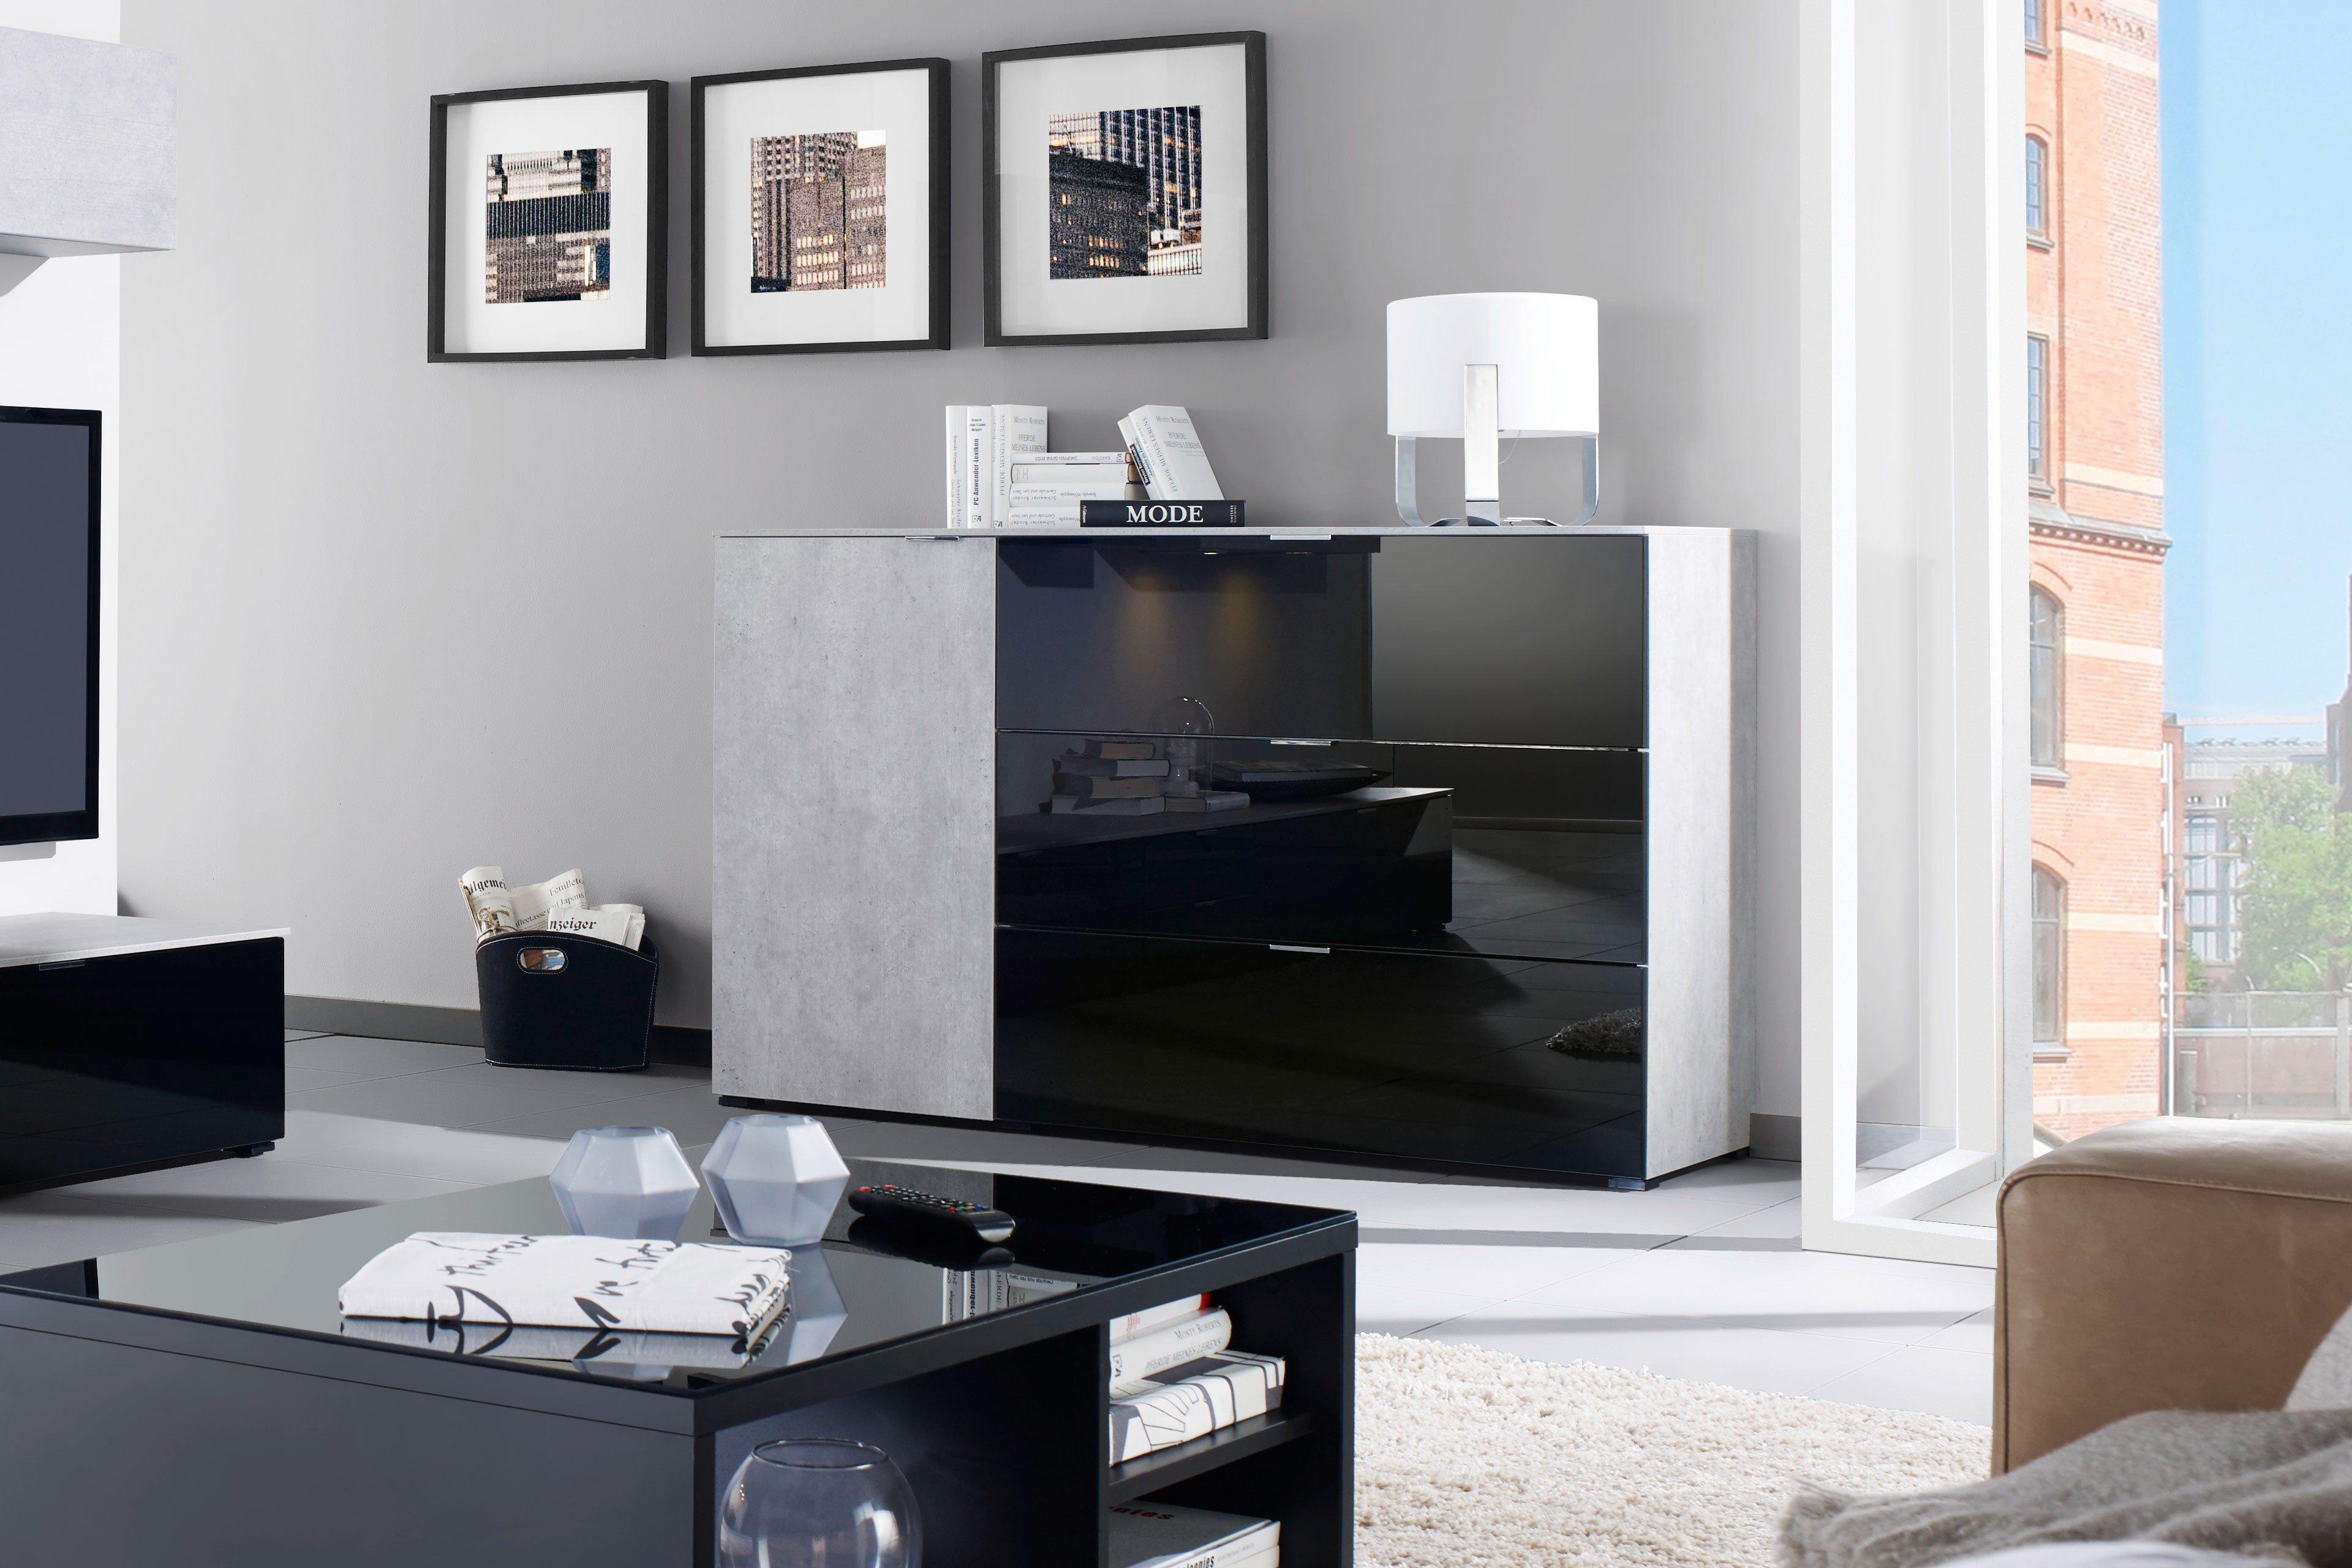 cs schmalm bel kommode cleo beton schwarzglas m bel letz ihr online shop. Black Bedroom Furniture Sets. Home Design Ideas